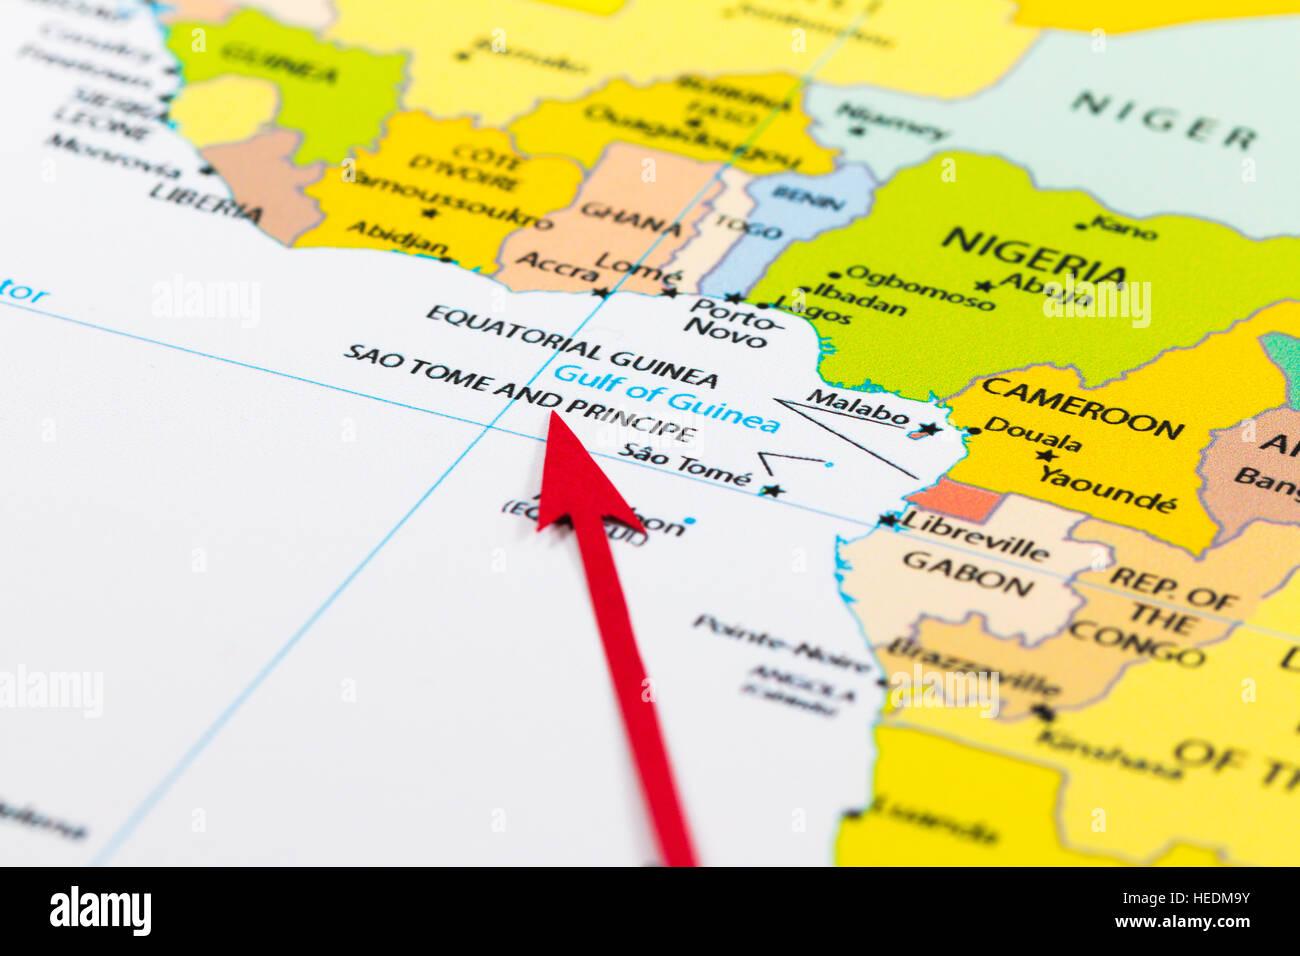 Sao Tome And Principe Map Stock Photos & Sao Tome And ... Sao Tome Principe Map on eritrea map, hong kong map, u.a.e. map, saudi arabia map, seychelles map, trinidad & tobago map, united arab emirates map, tanzania map, central african republic map, principe island map, bangladesh map, comoros map, tunisia map, niue map, honshu island map, tokelau map, sri lanka map, lesotho map, new britain island map,